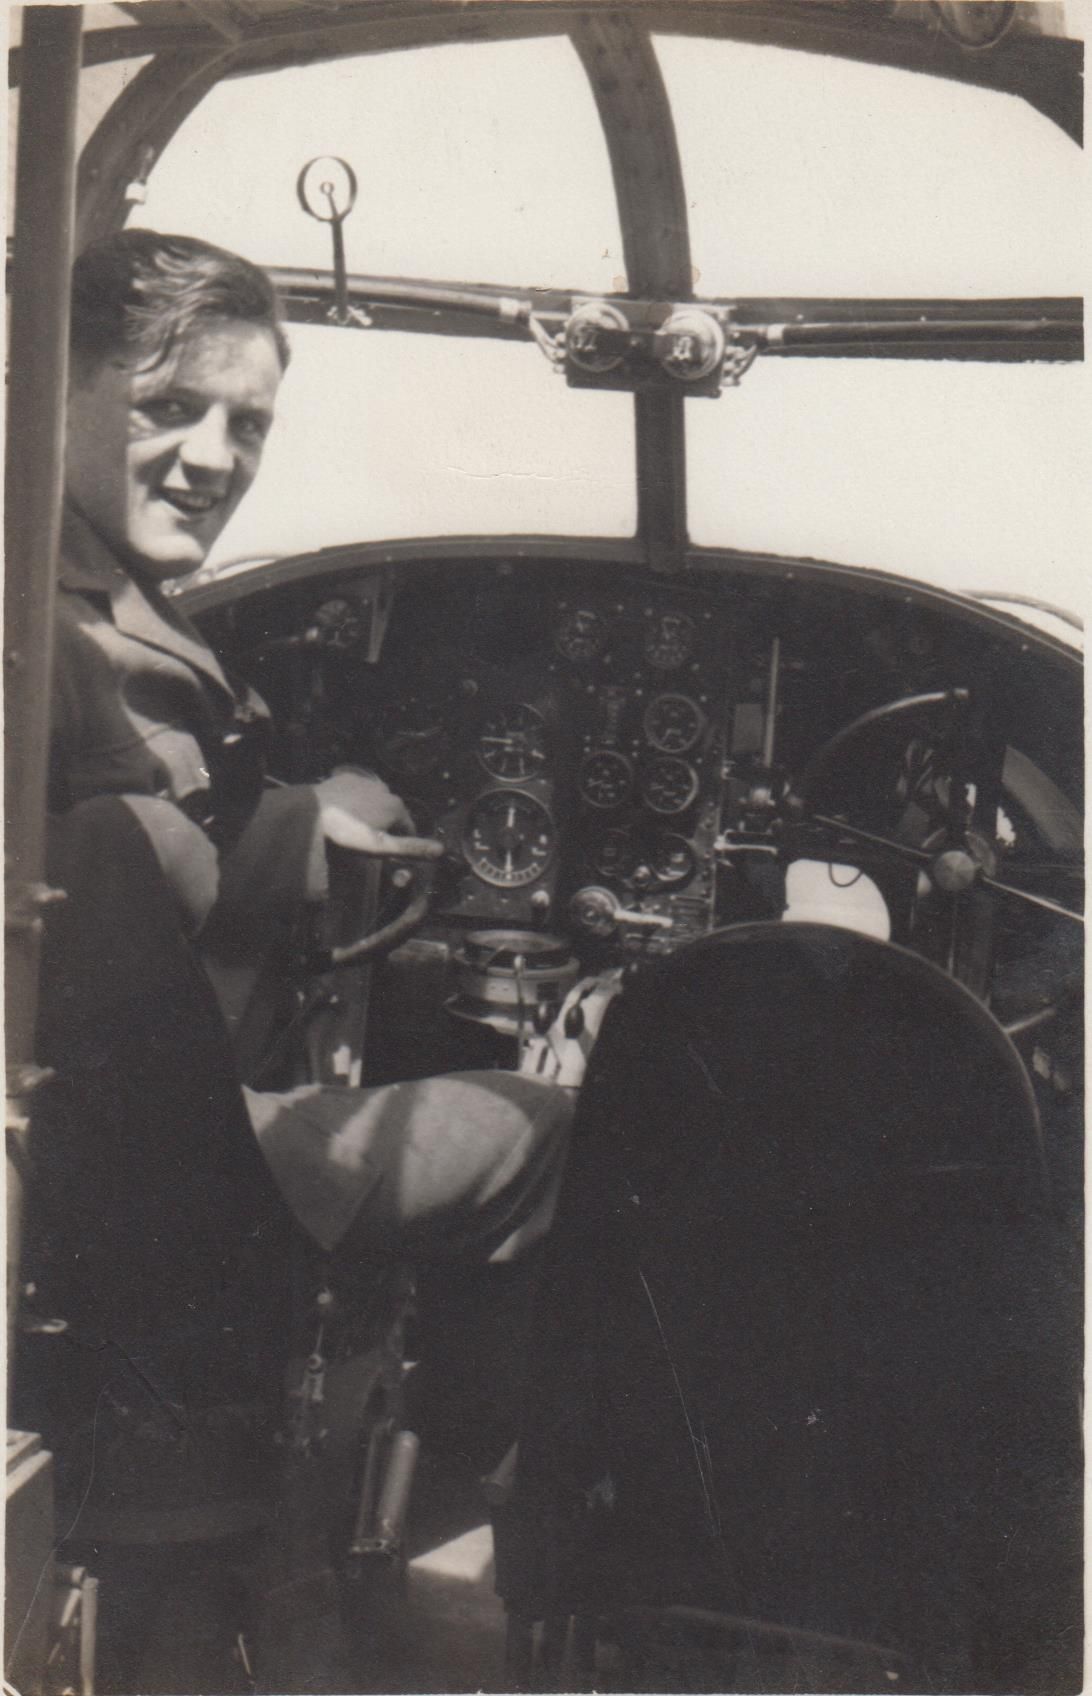 pim_in_pilots_seat_001.jpg